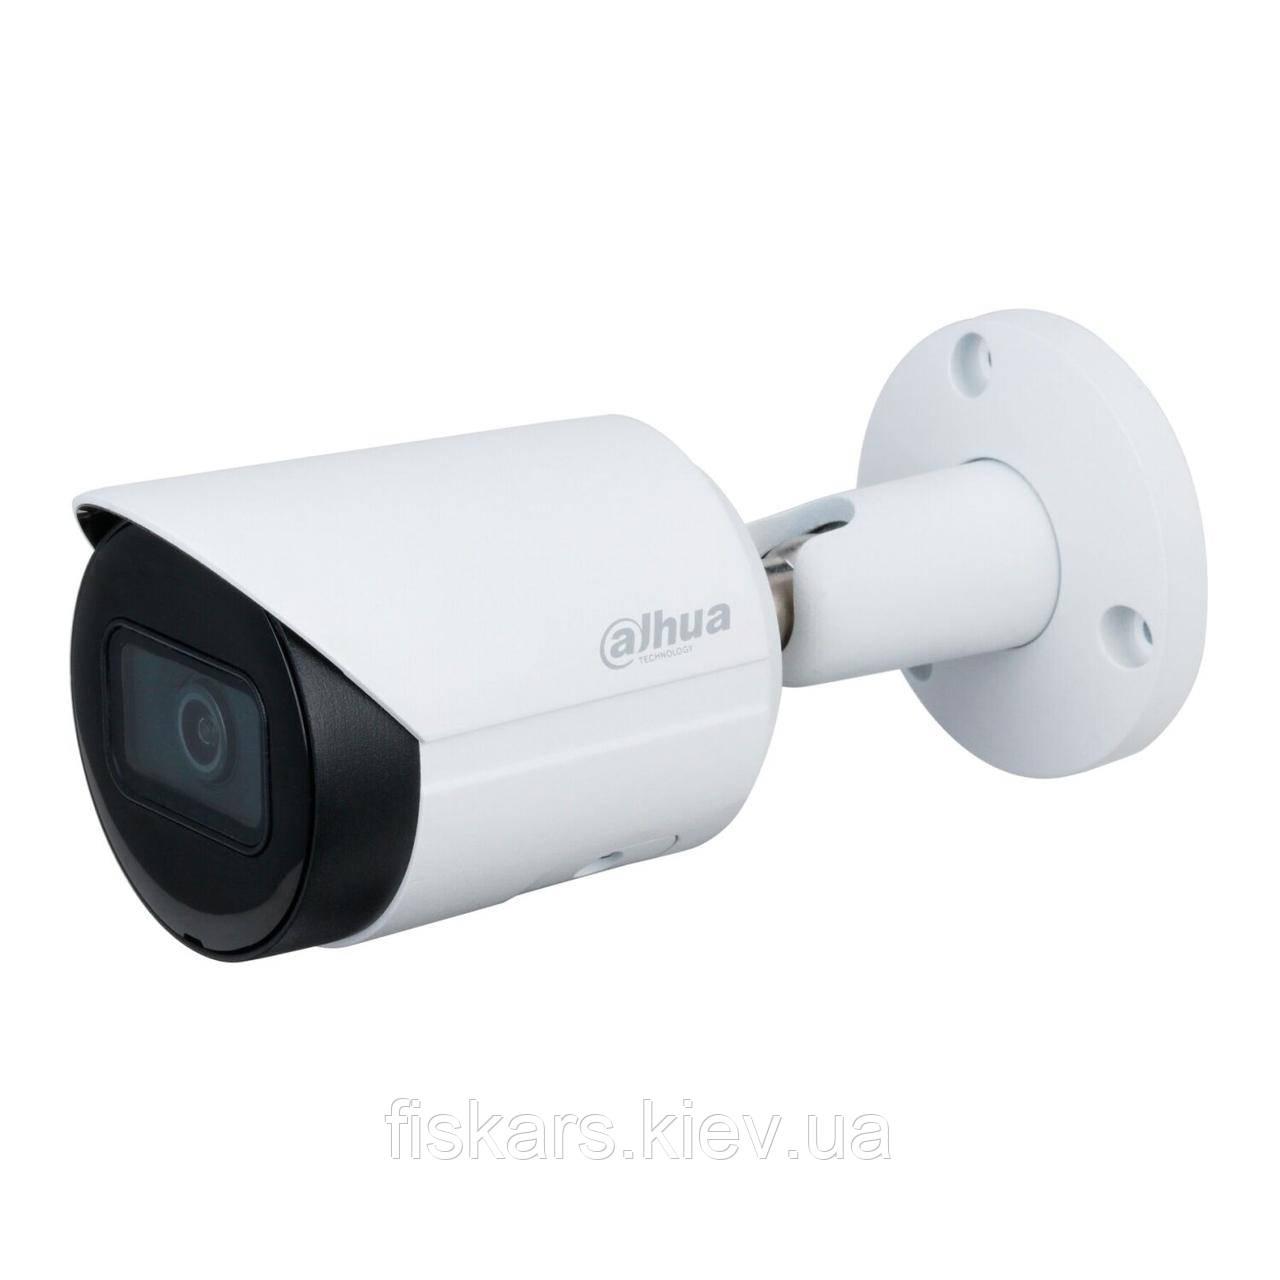 5 Mп IP-камера Dahua DH-IPC-HFW2531SP-S-S2